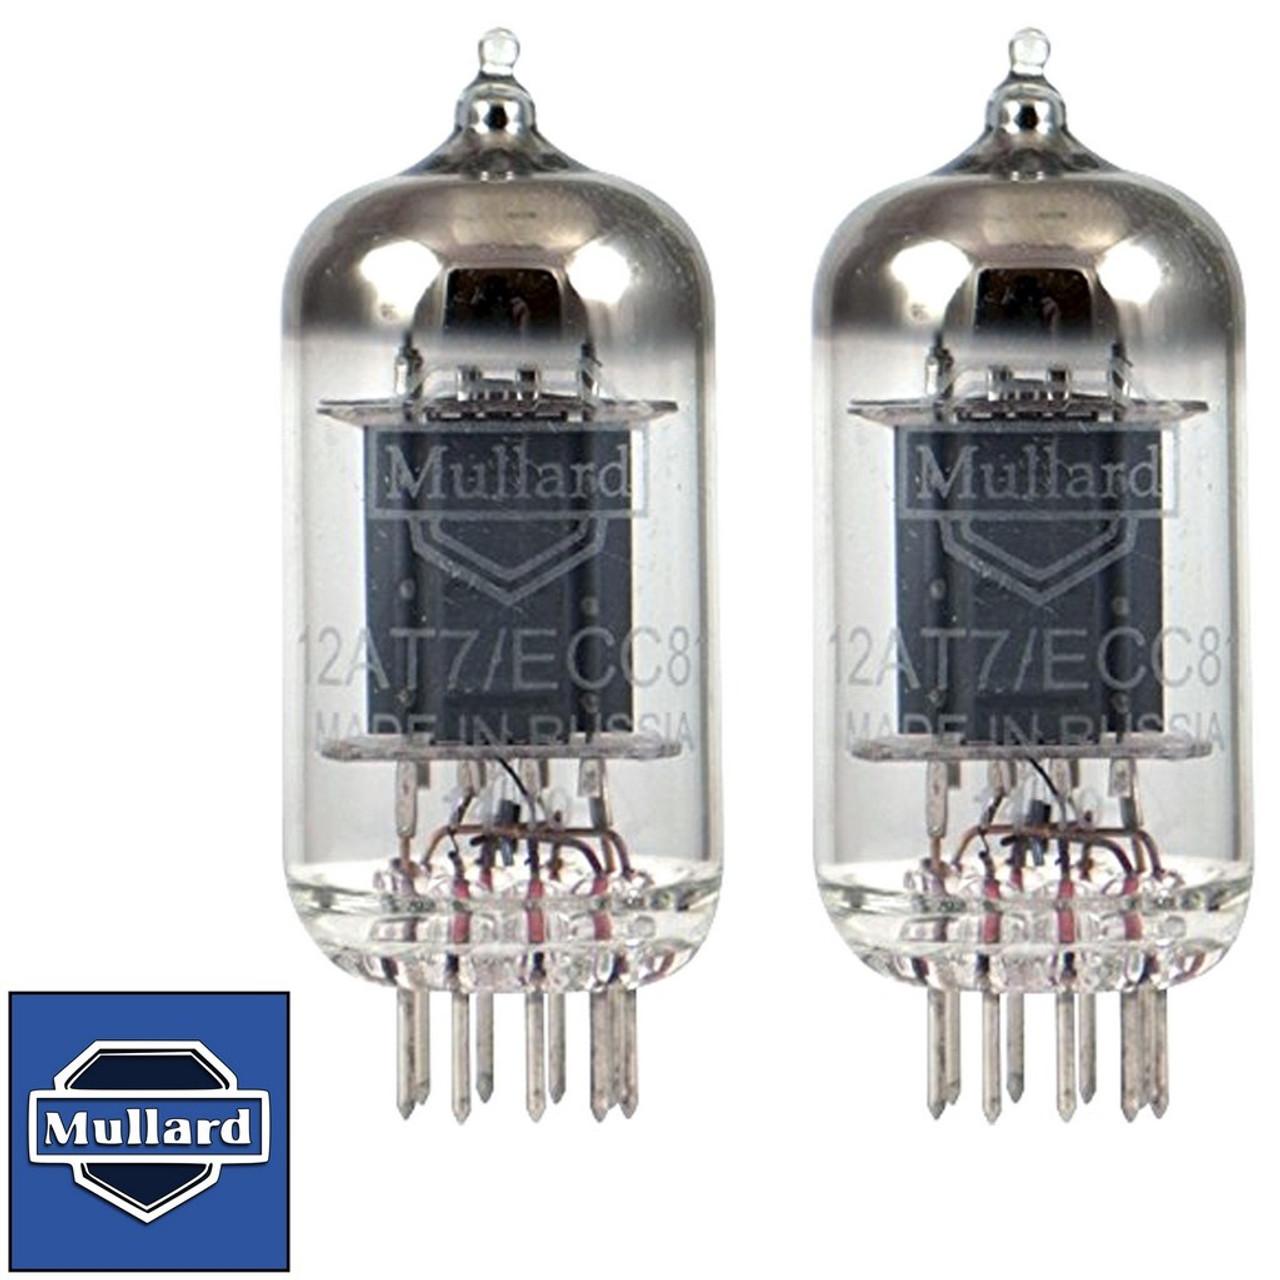 vacuum tube set 1 5U4 2 6V6GT 3 12AX7 1 12AT7